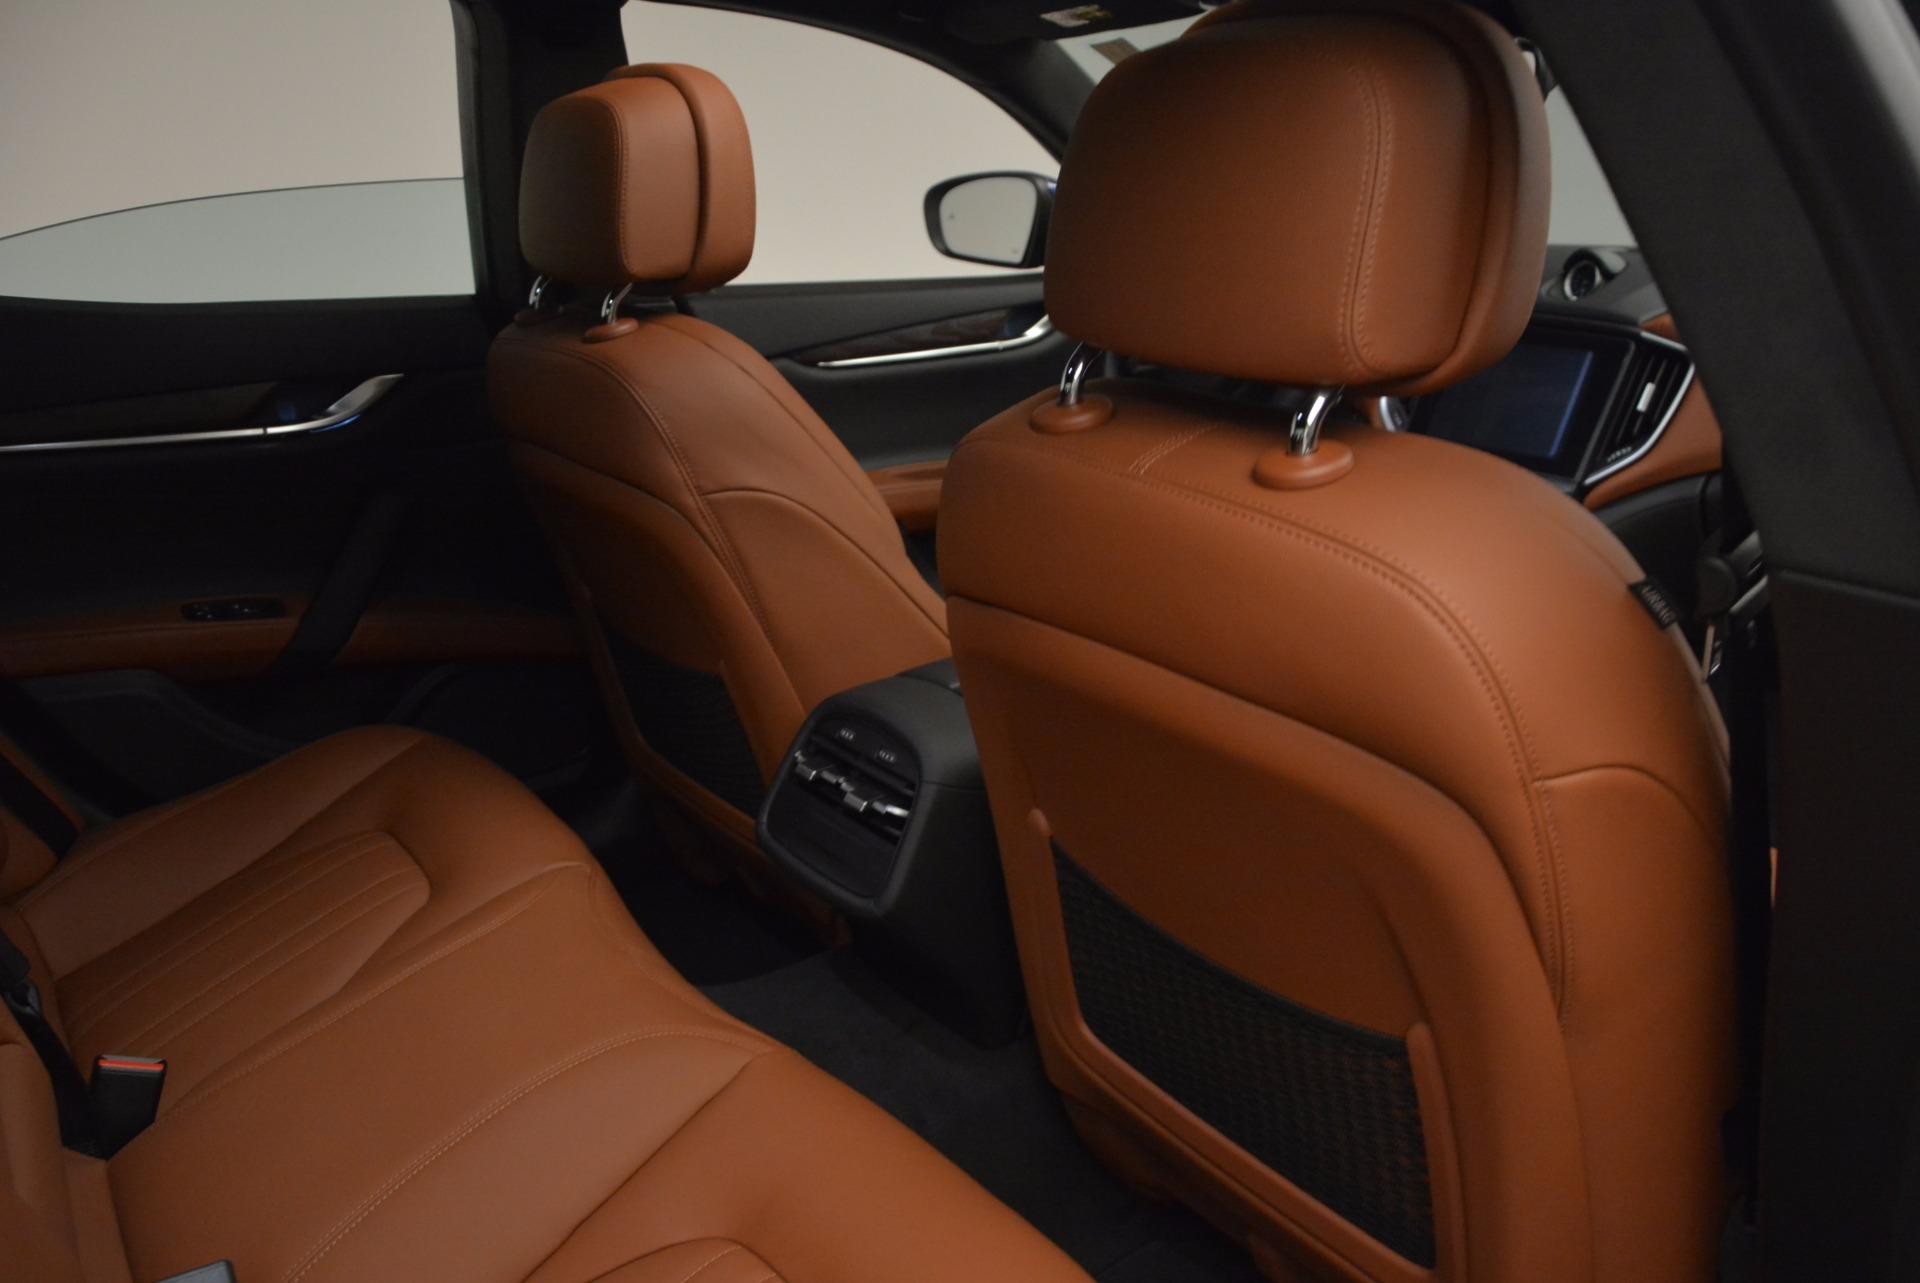 Used 2017 Maserati Ghibli S Q4 Ex-Loaner For Sale In Greenwich, CT 1165_p20